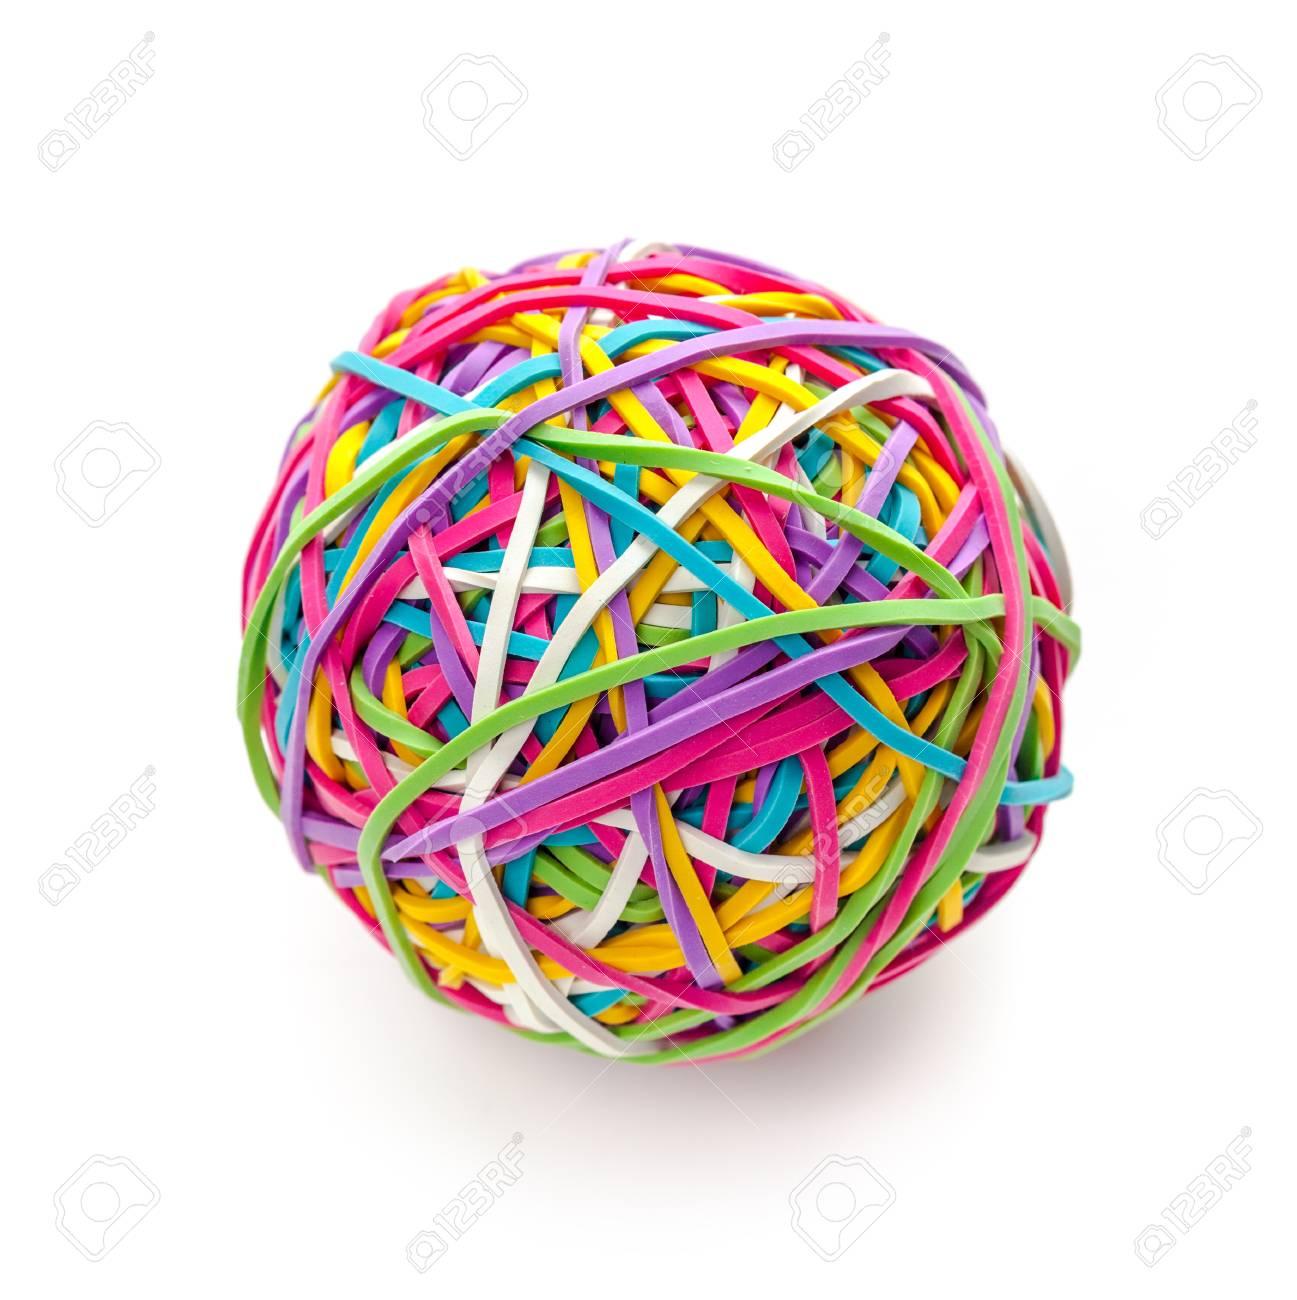 Rubber band ball - 78651337